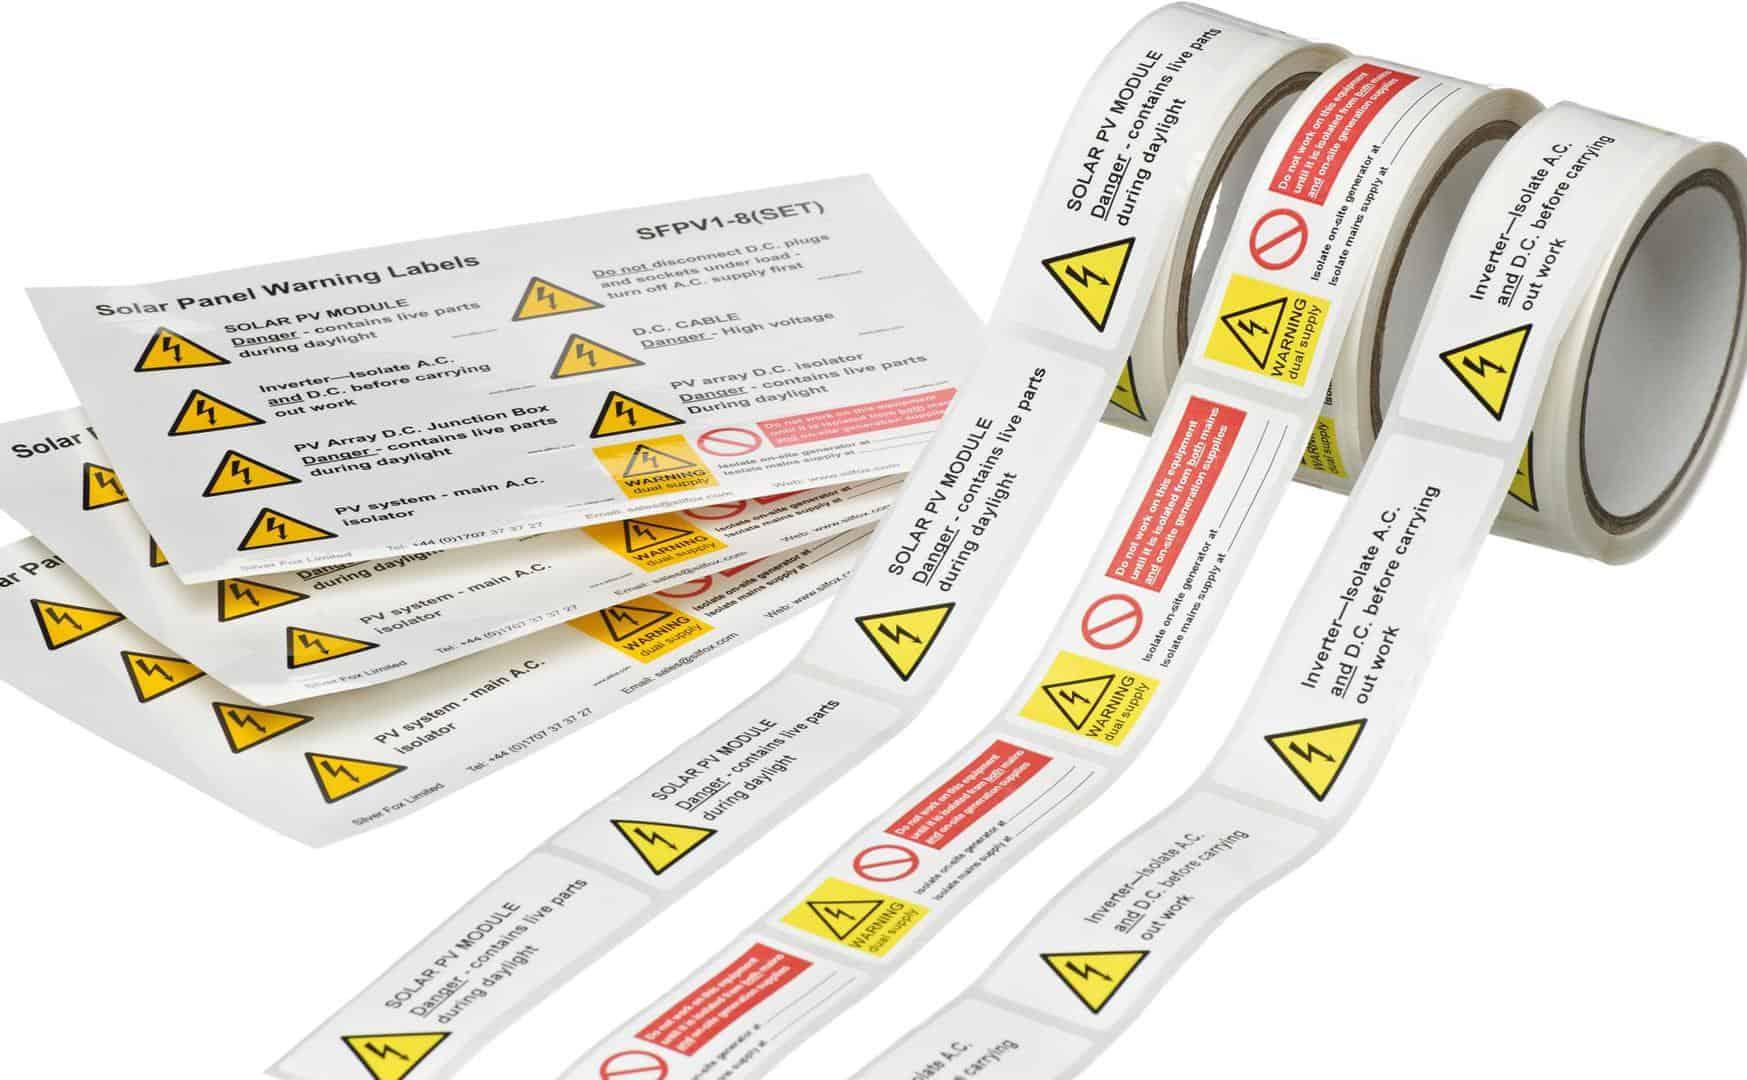 solar panel warning labels